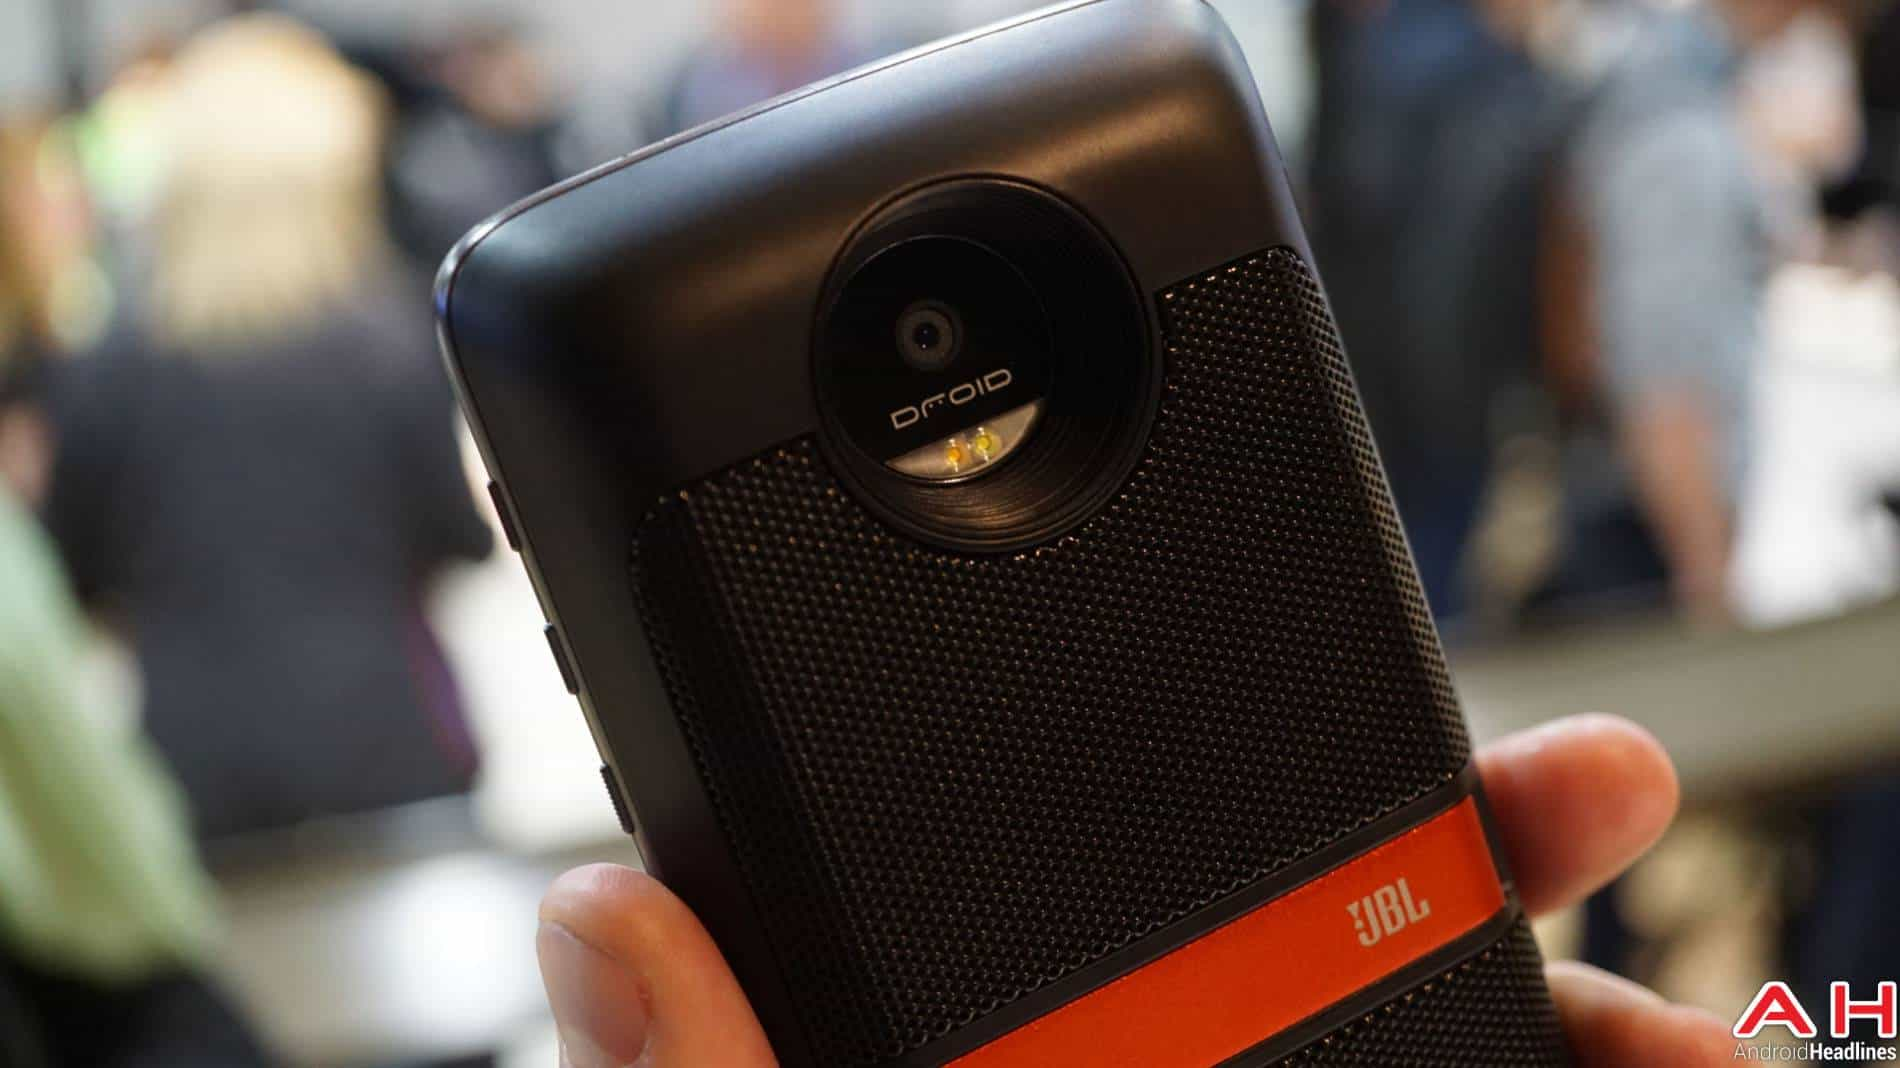 JBL Moto Mods Lenovo Hands On AH 3 4